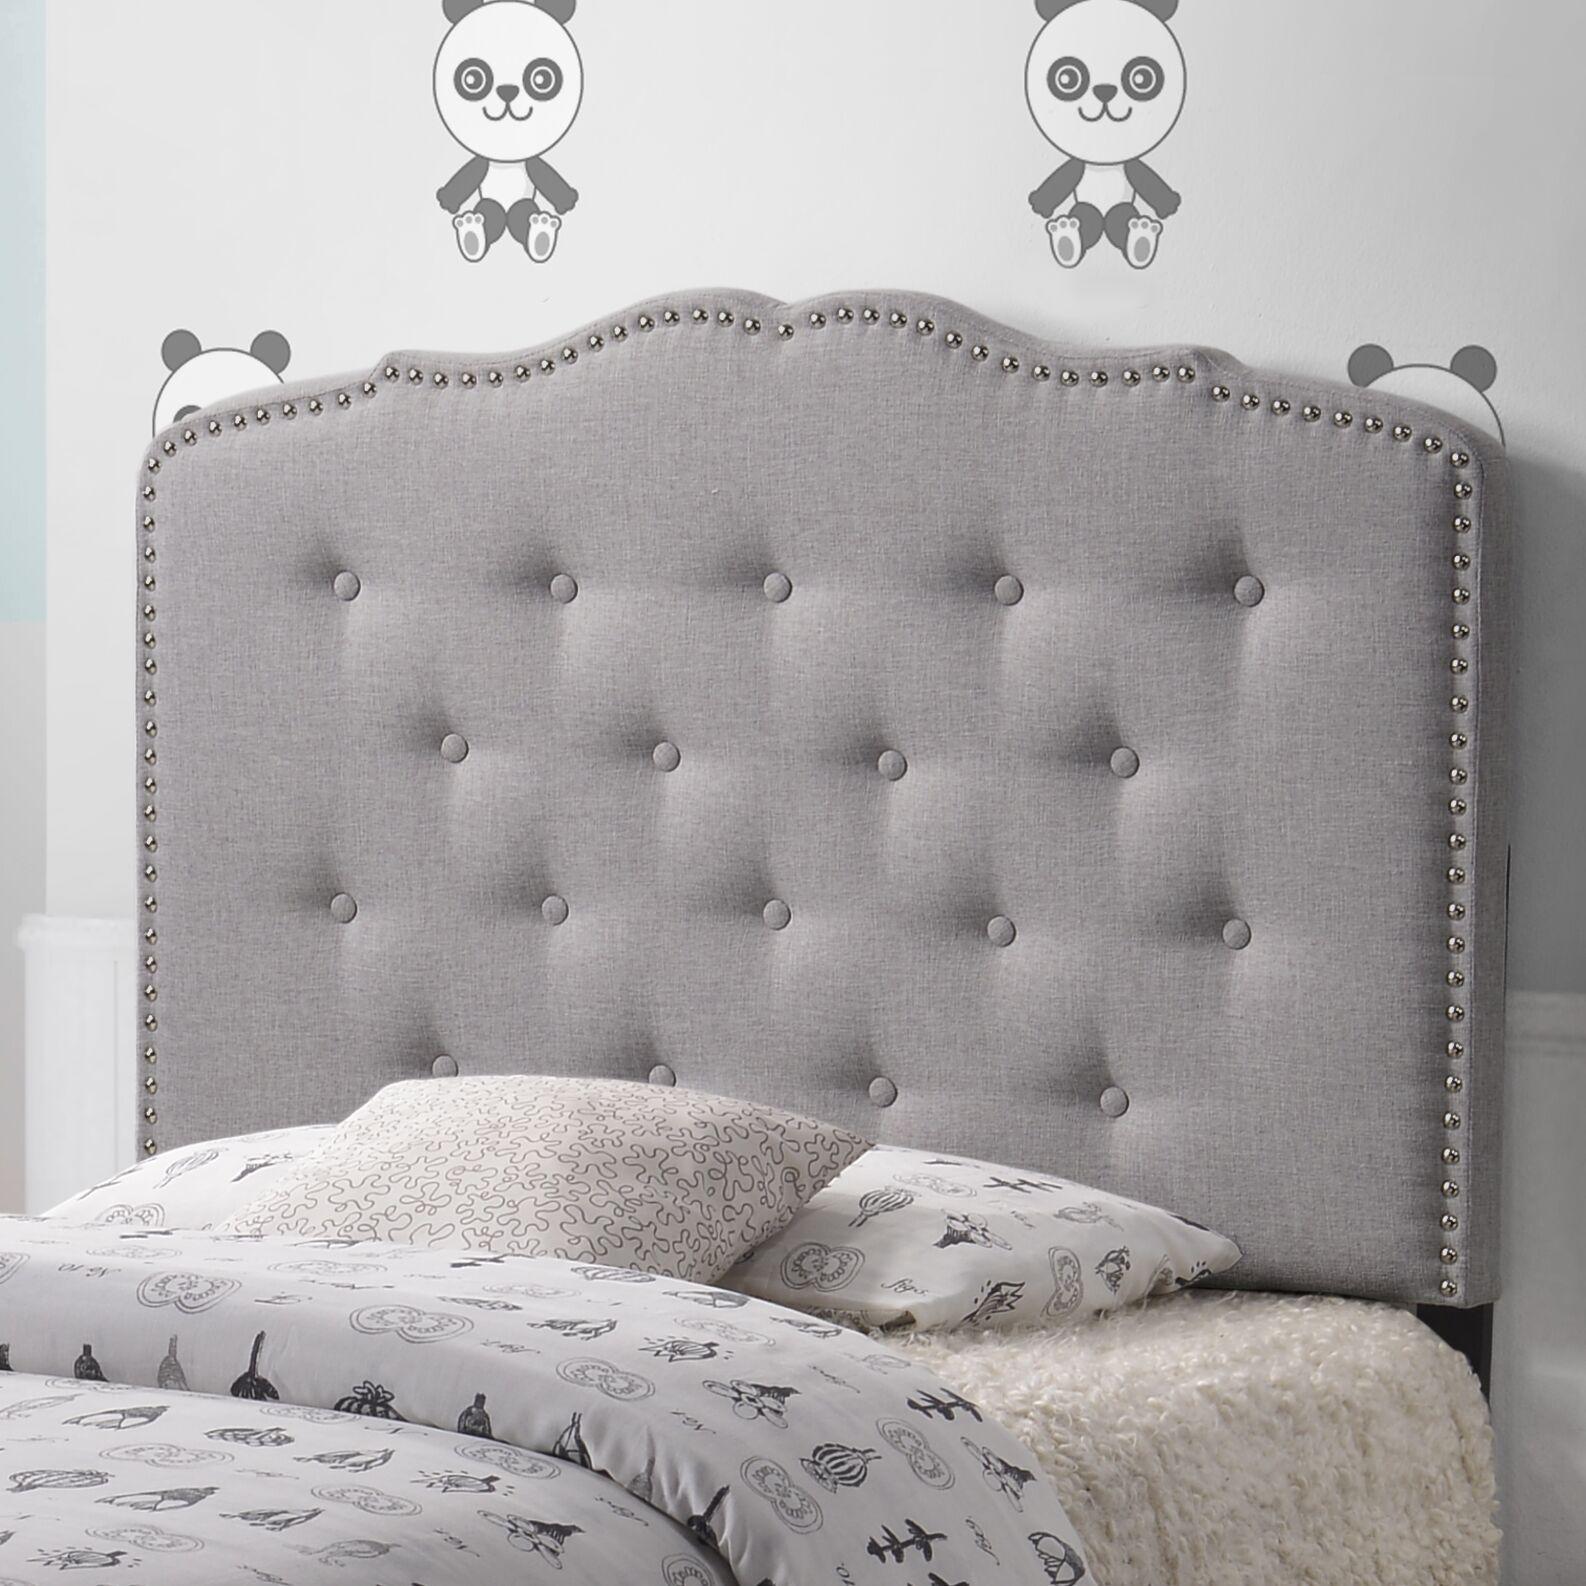 Fabiana Upholstered Panel Headboard Upholstery: Grayish Beige, Size: King